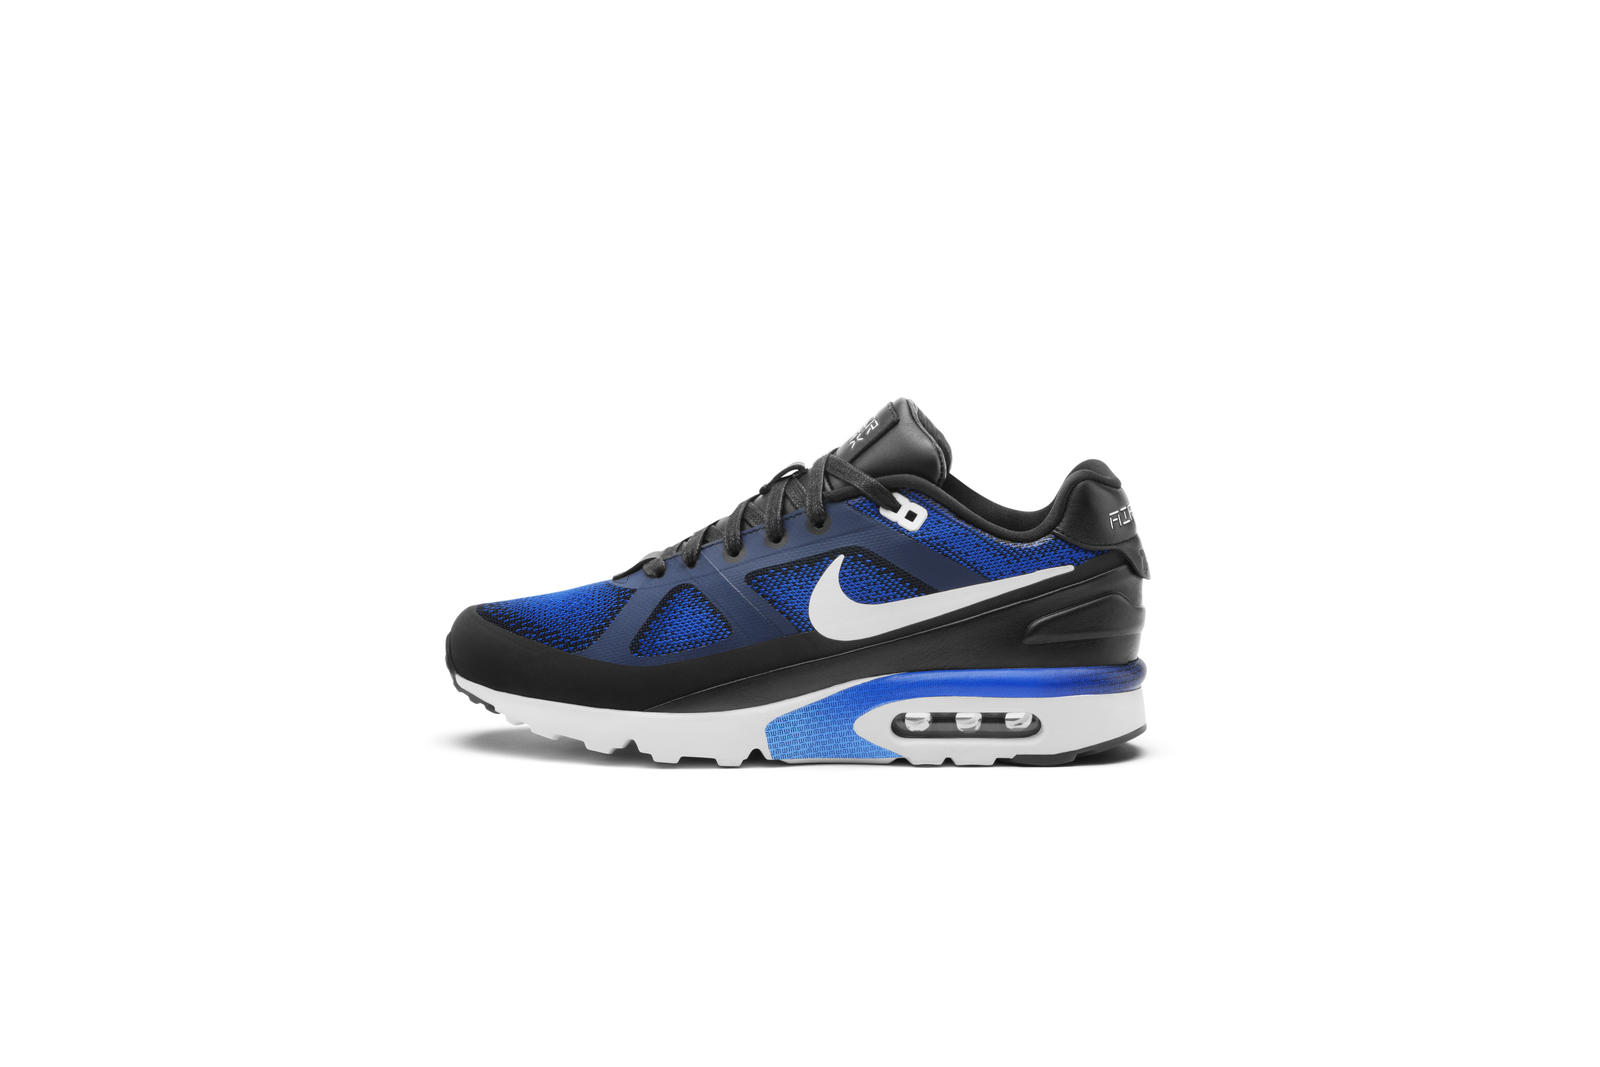 nike air force femme foot locker - Nike News - Mark Parker's Nike Air Max Ultra M